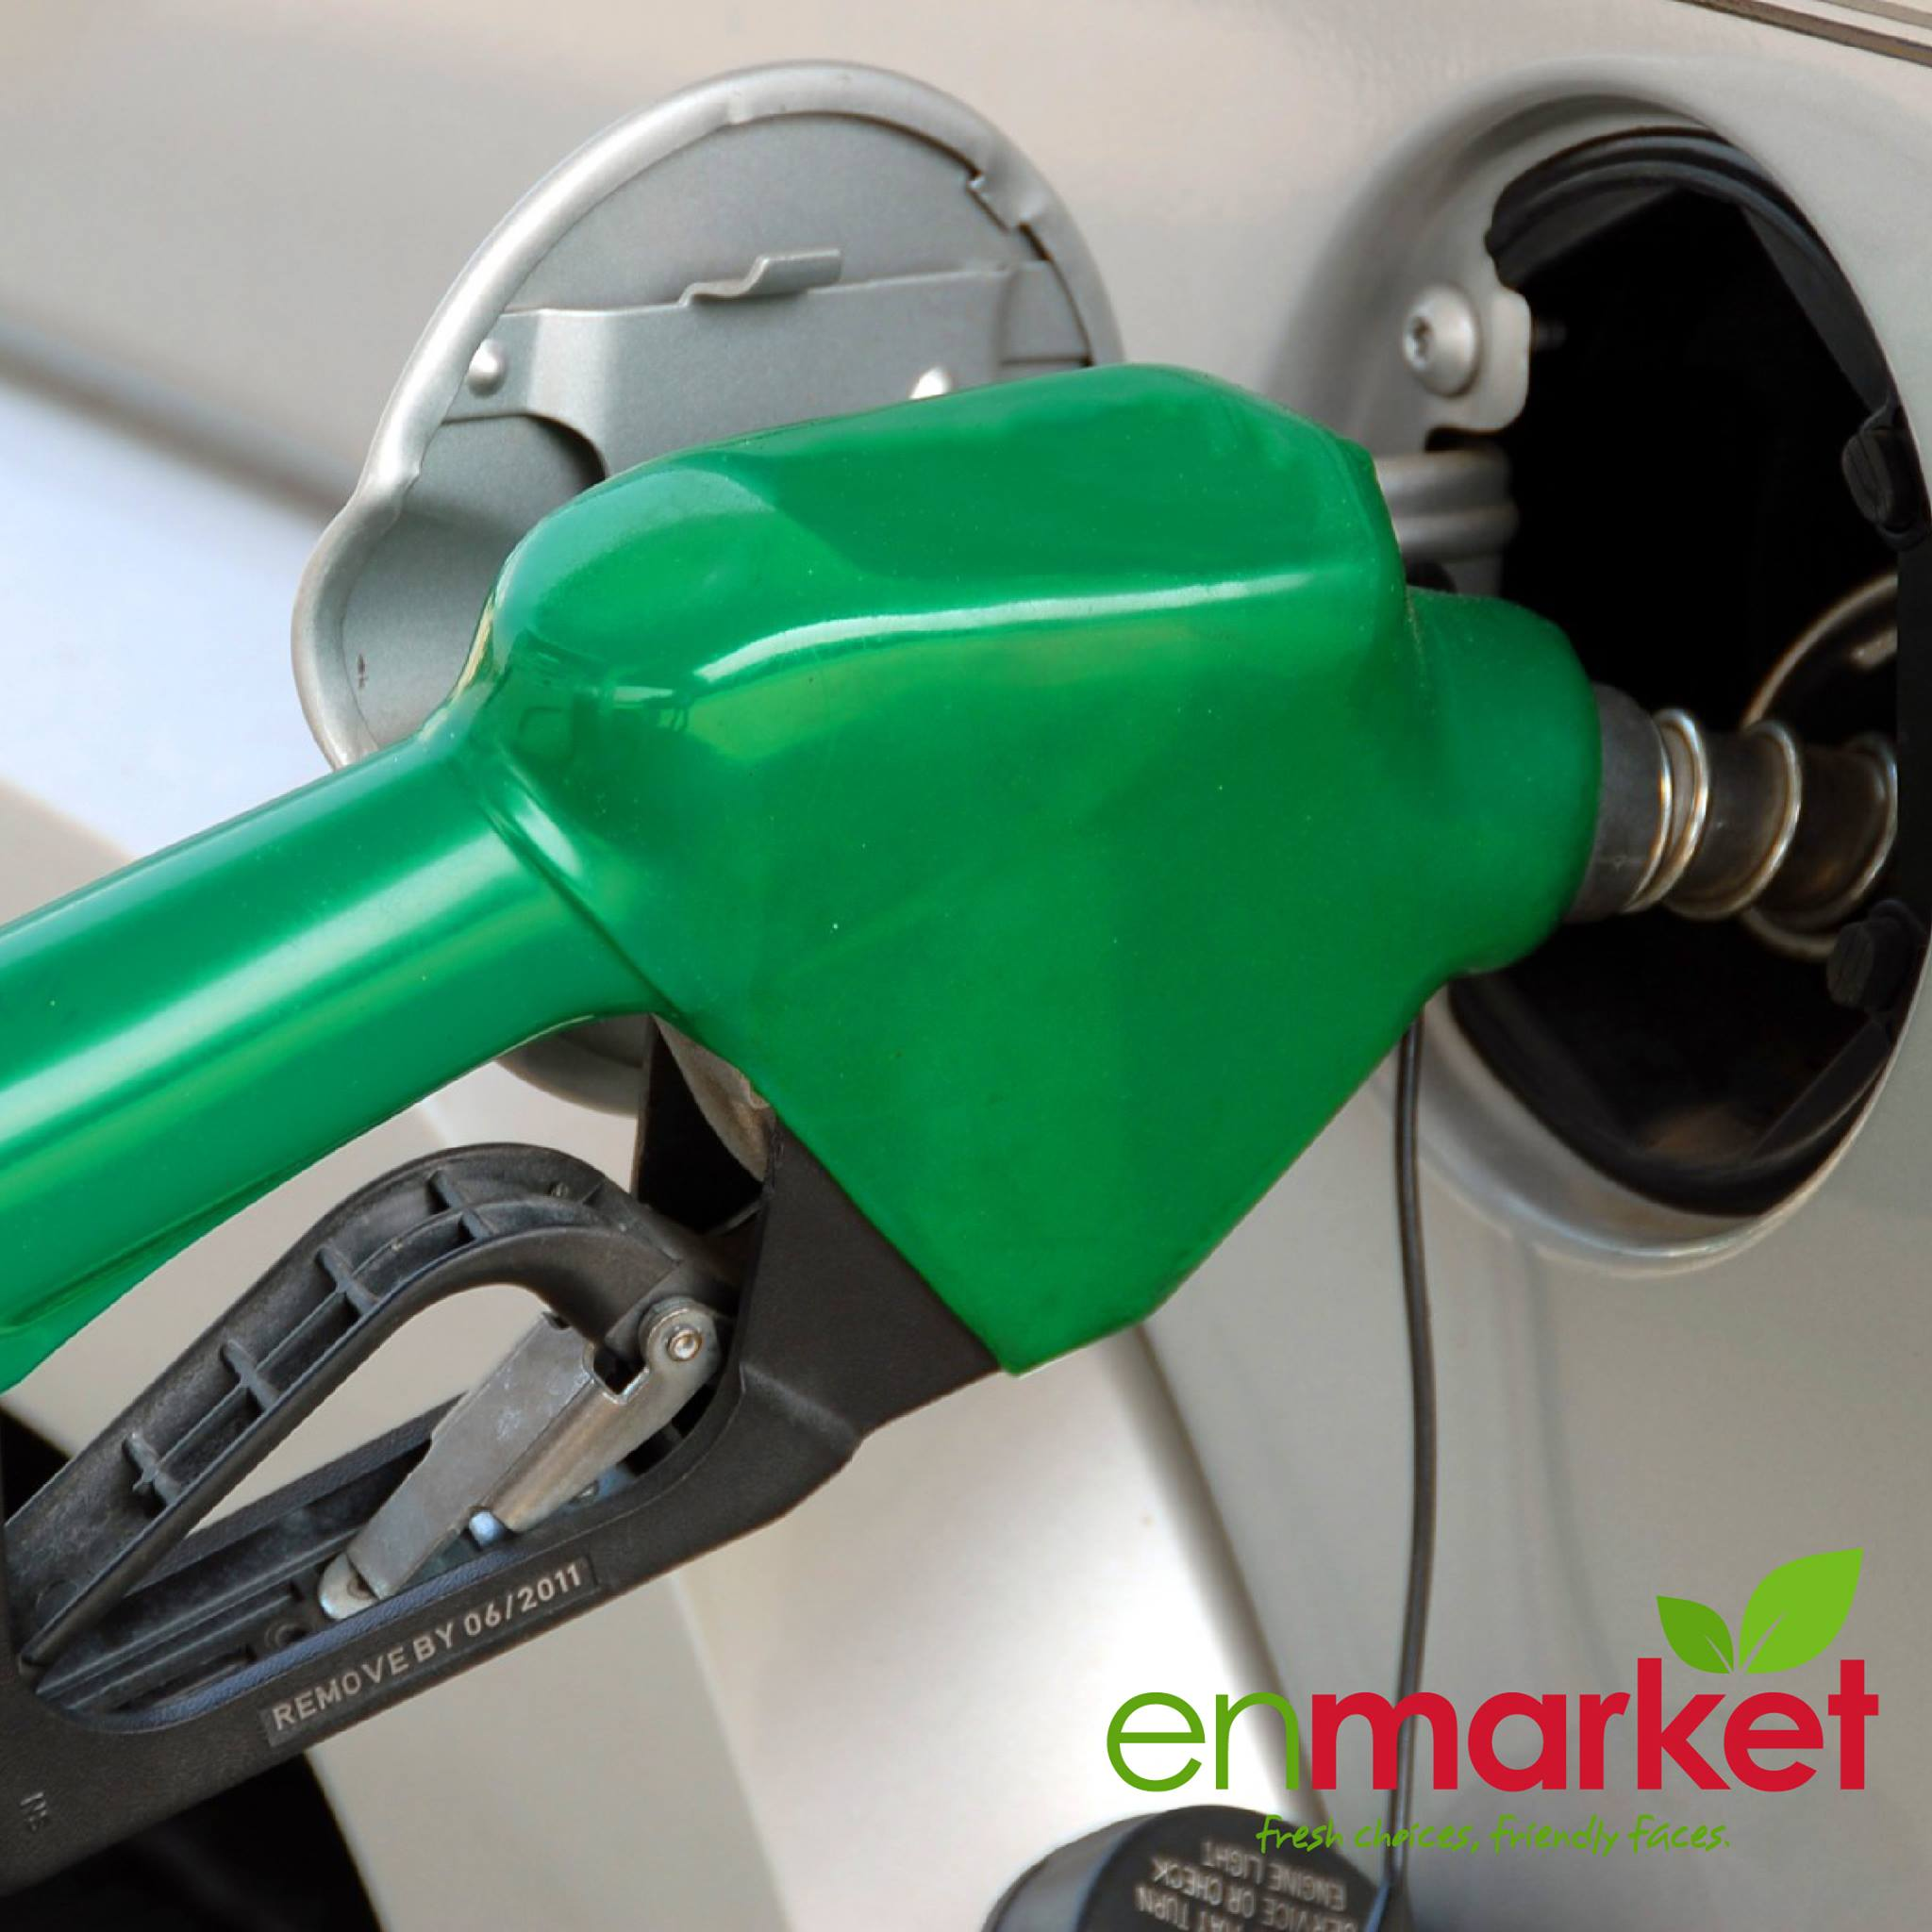 Gas & Car Wash - Visit Your Local Enmarket